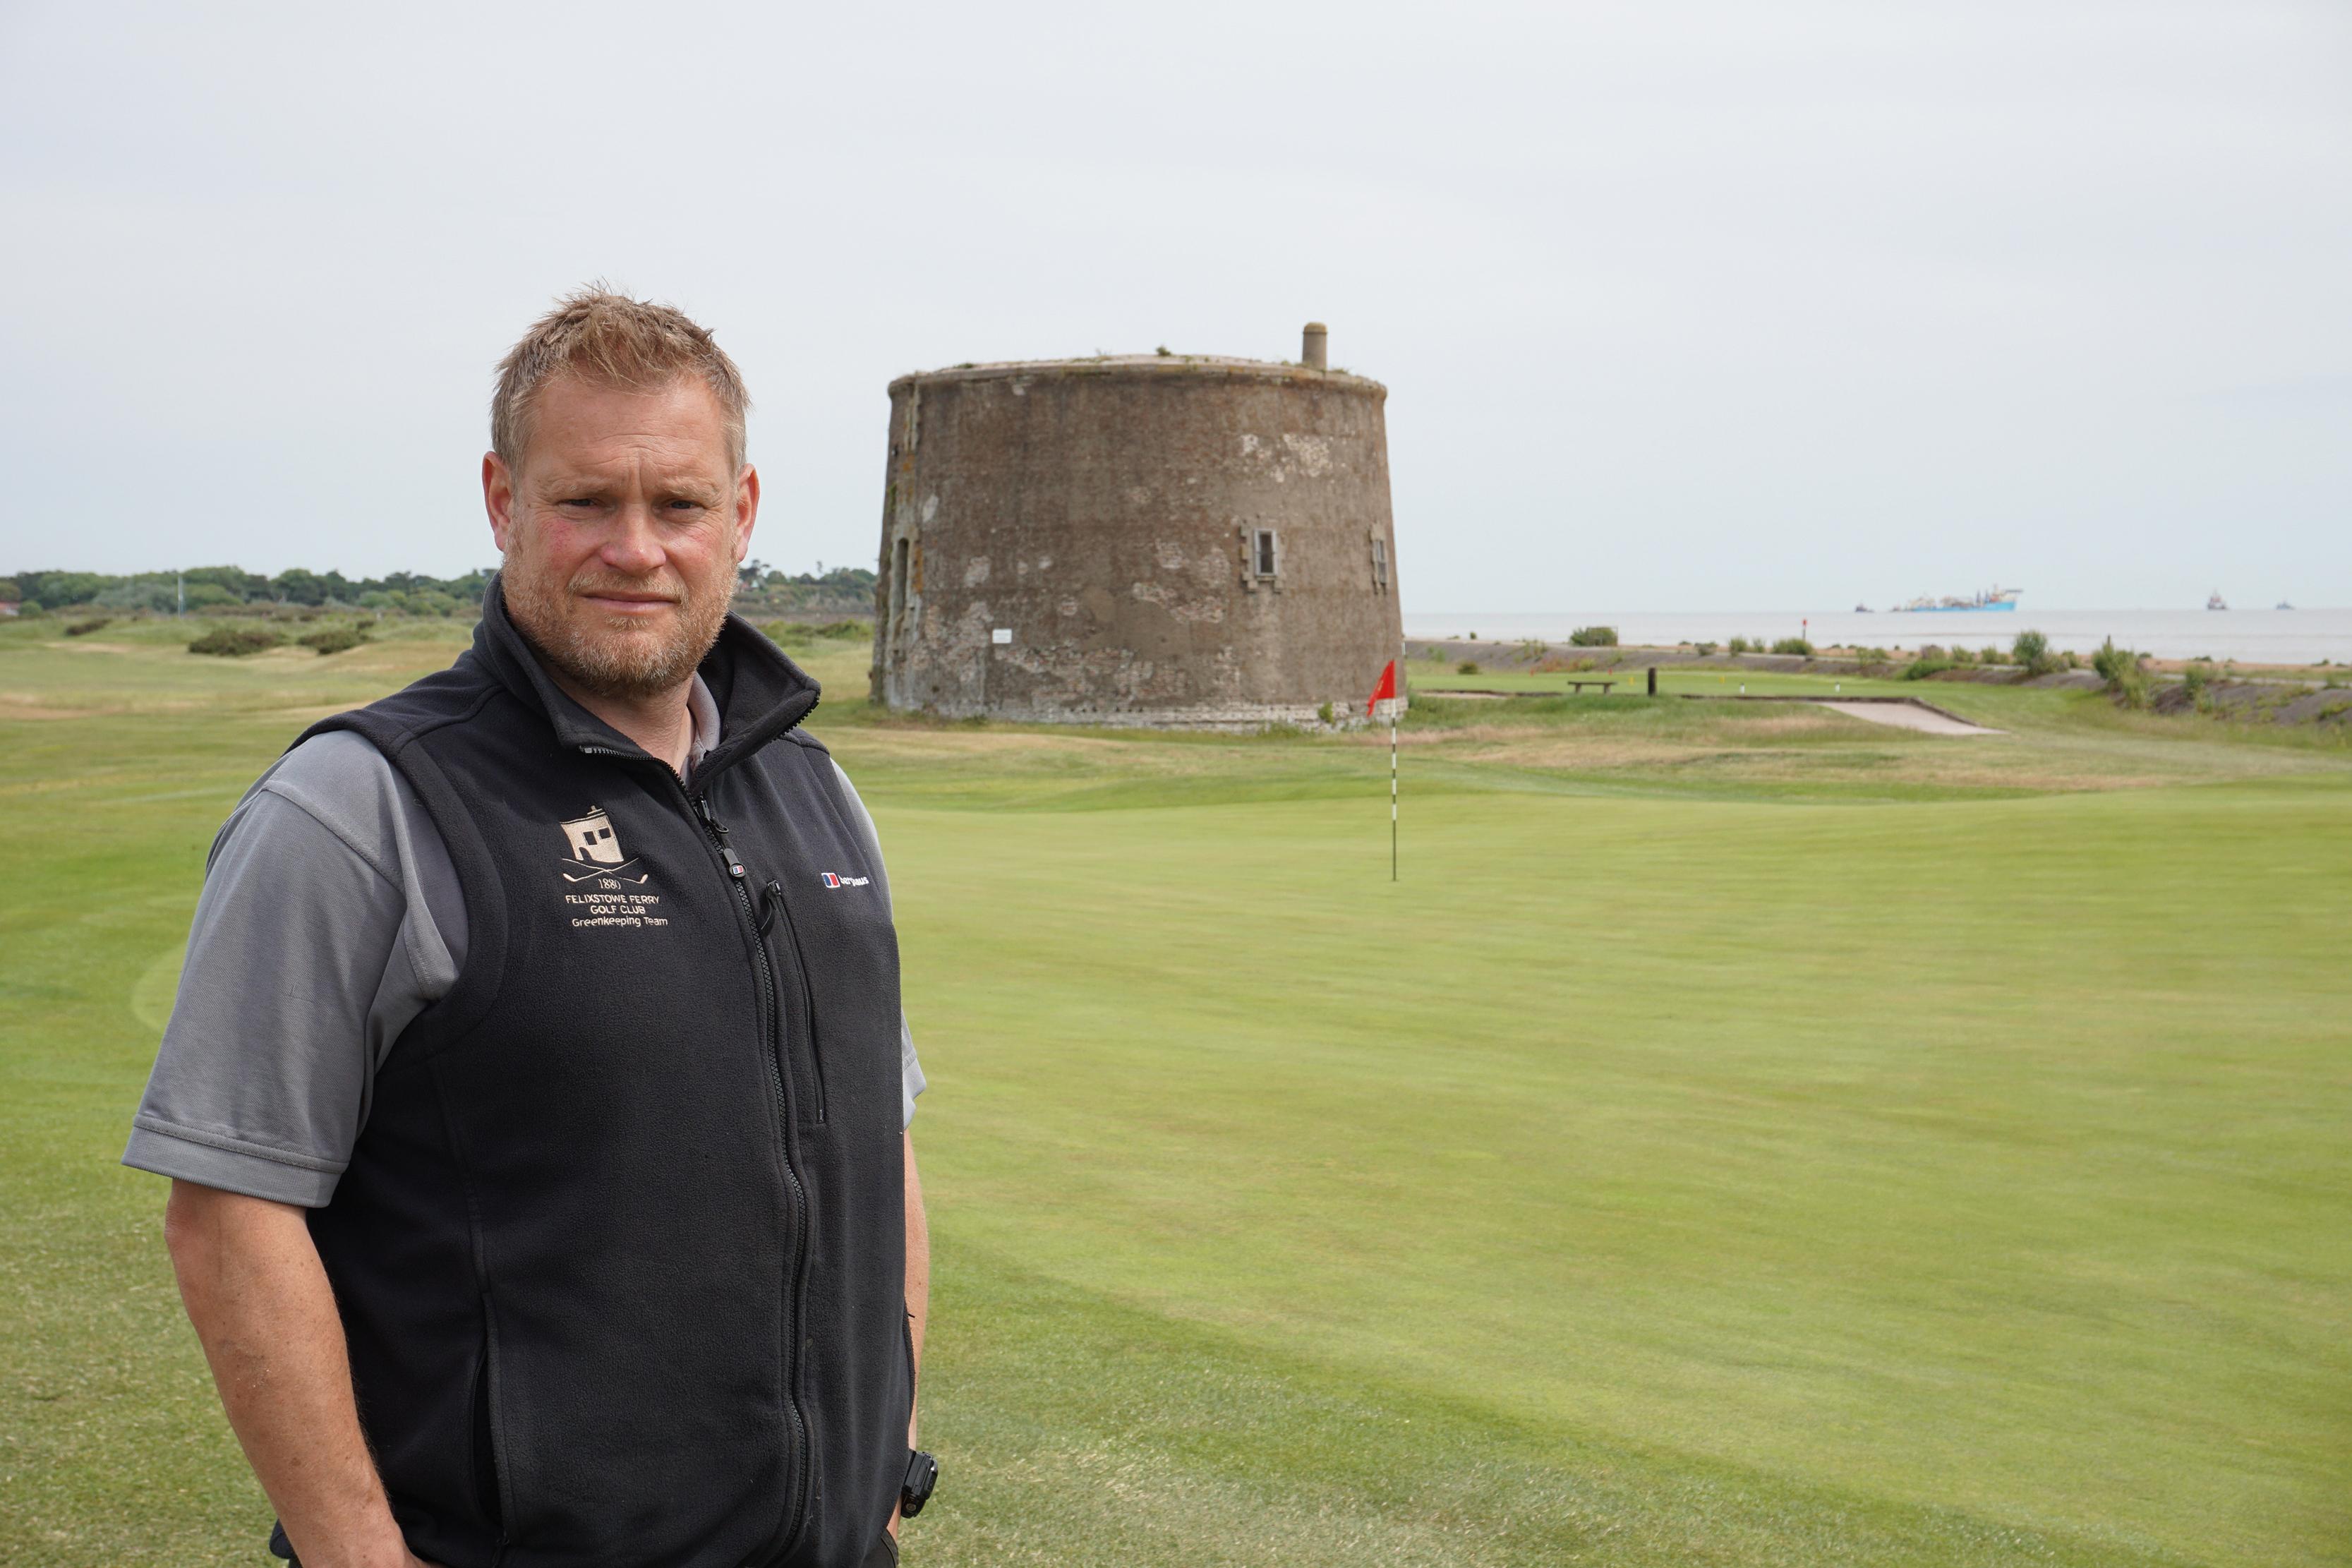 Felixstowe Ferry Golf Club - Glenn Rayfield making his own mark Background